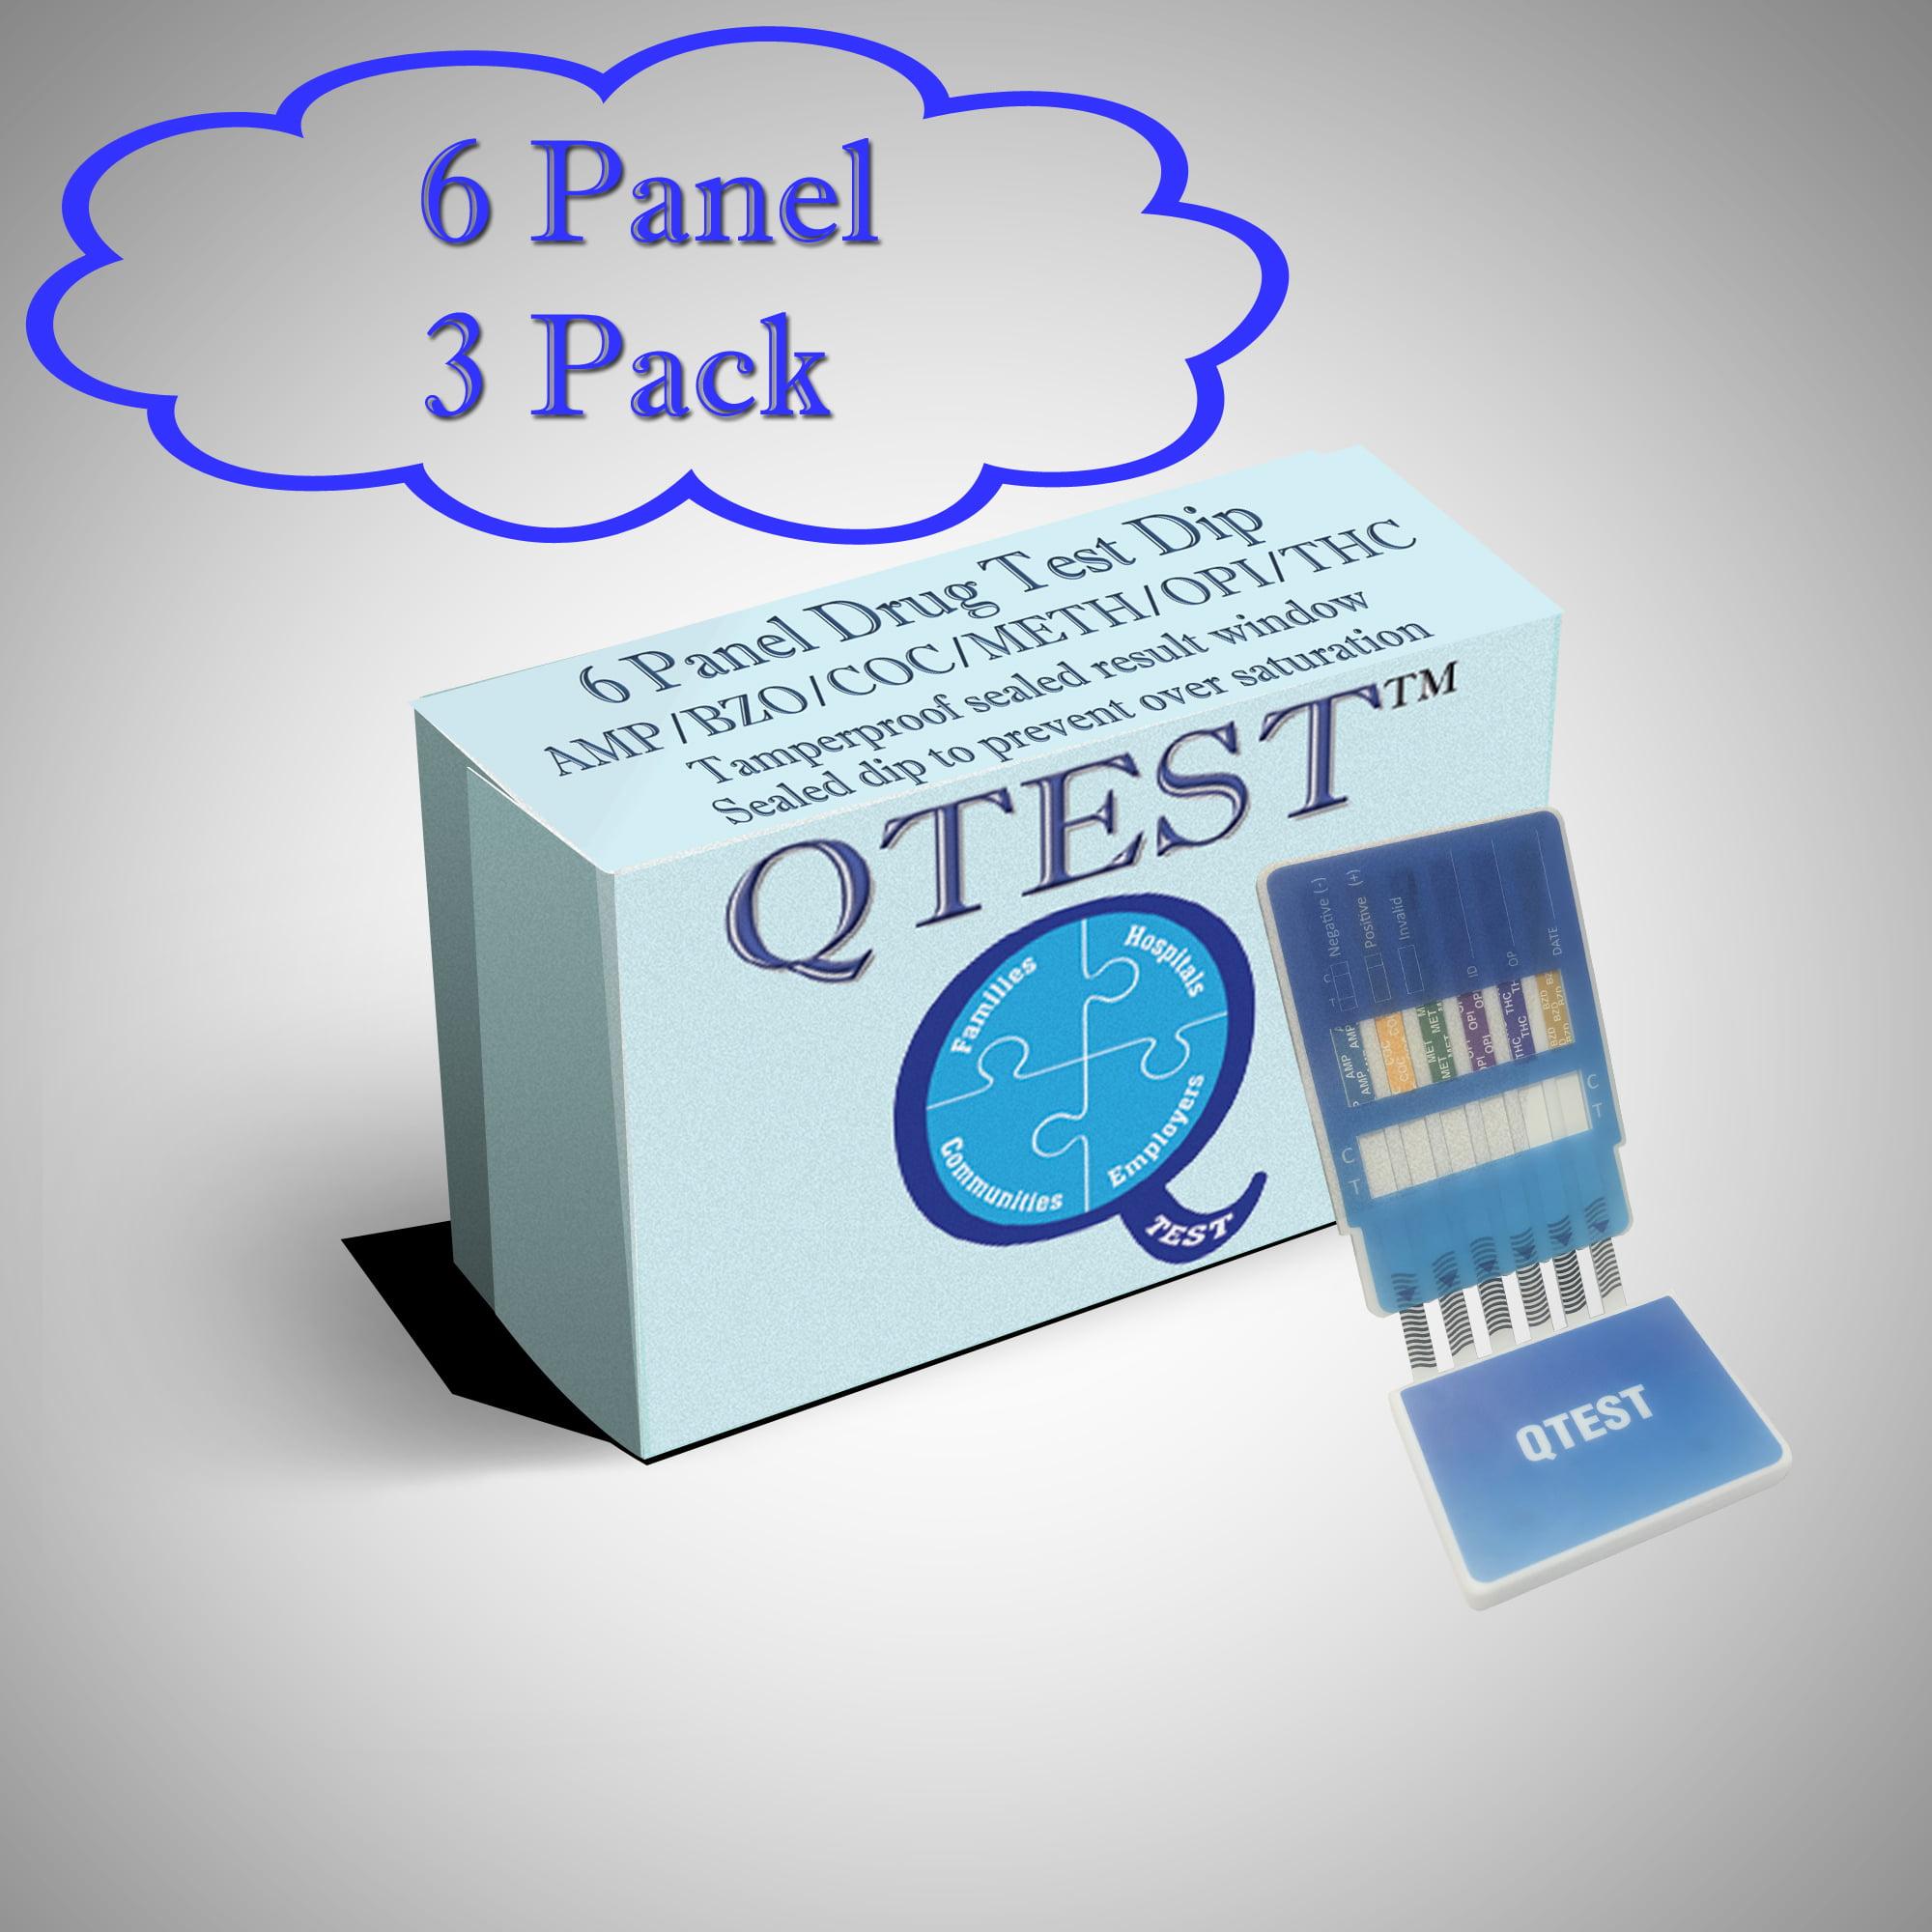 (3 Pack) QTEST 6 Panel Urine Drug Test Dip Tamper Proof - Amp (Amphetamine), Bzo (Benzodiazepine), Coc (Cocaine), Mamp (Methamphetamine, Opi (Opiates), Thc (Marijuana)